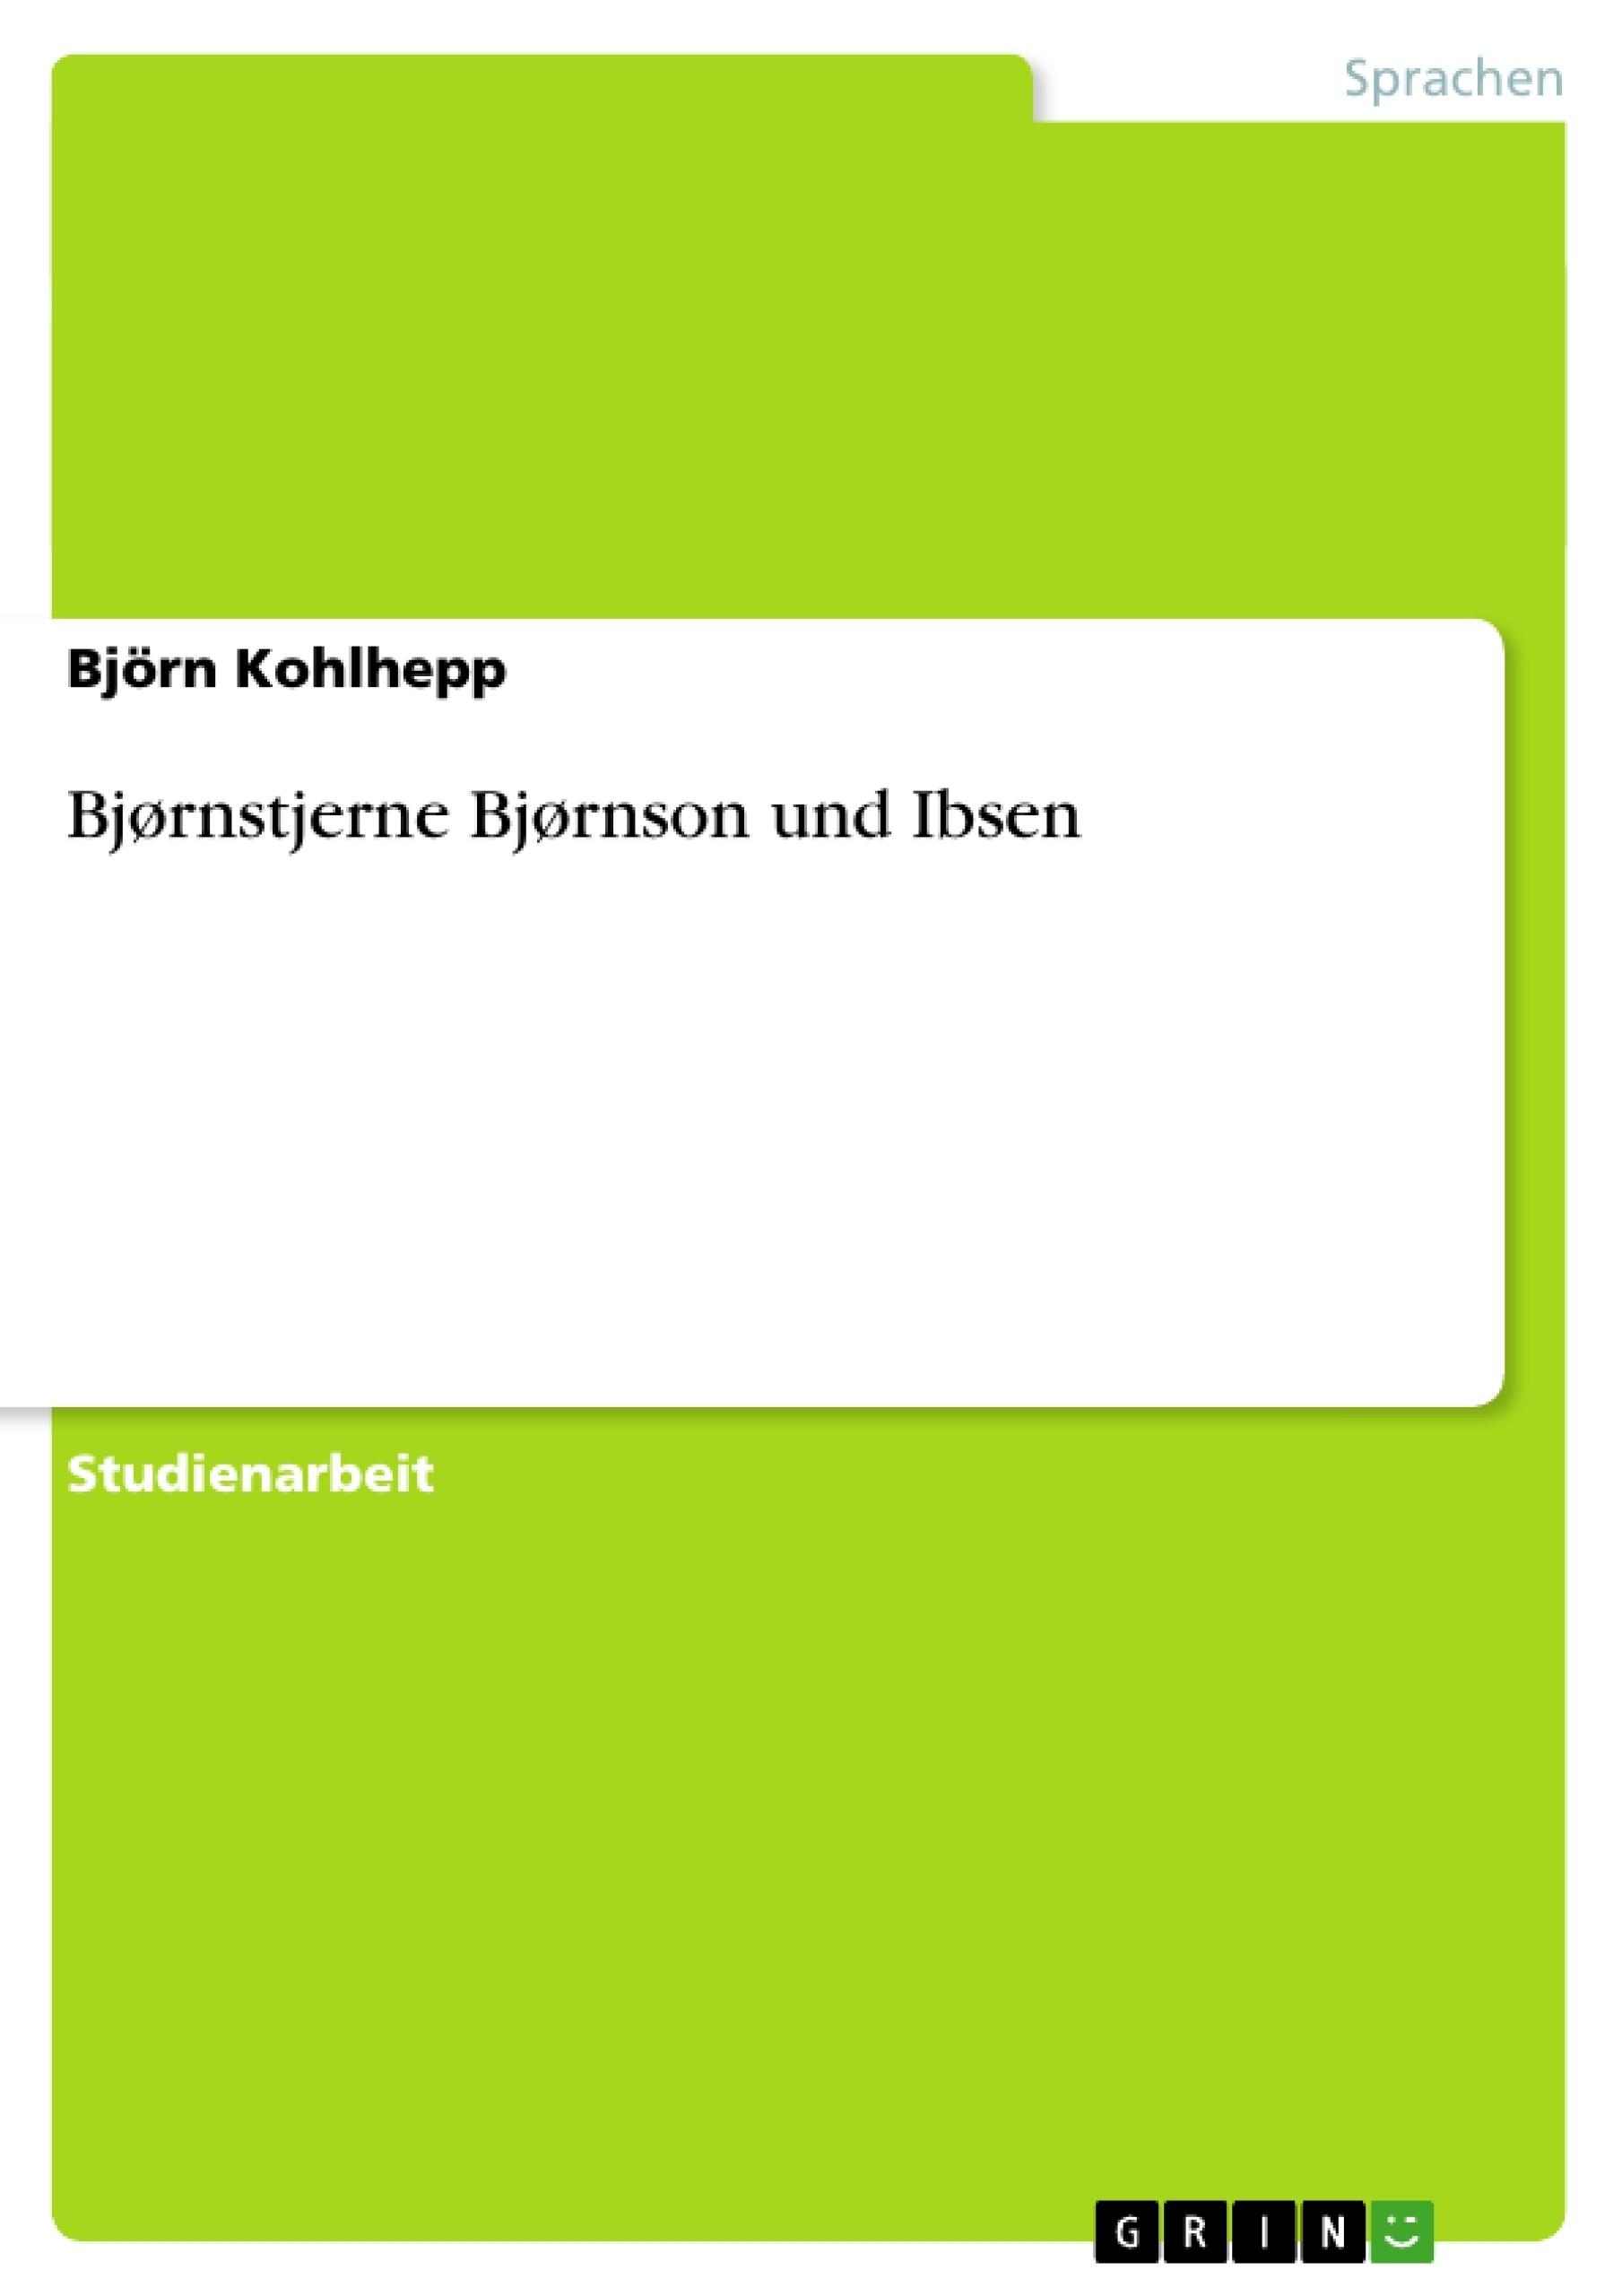 Titel: Bjørnstjerne Bjørnson und Ibsen